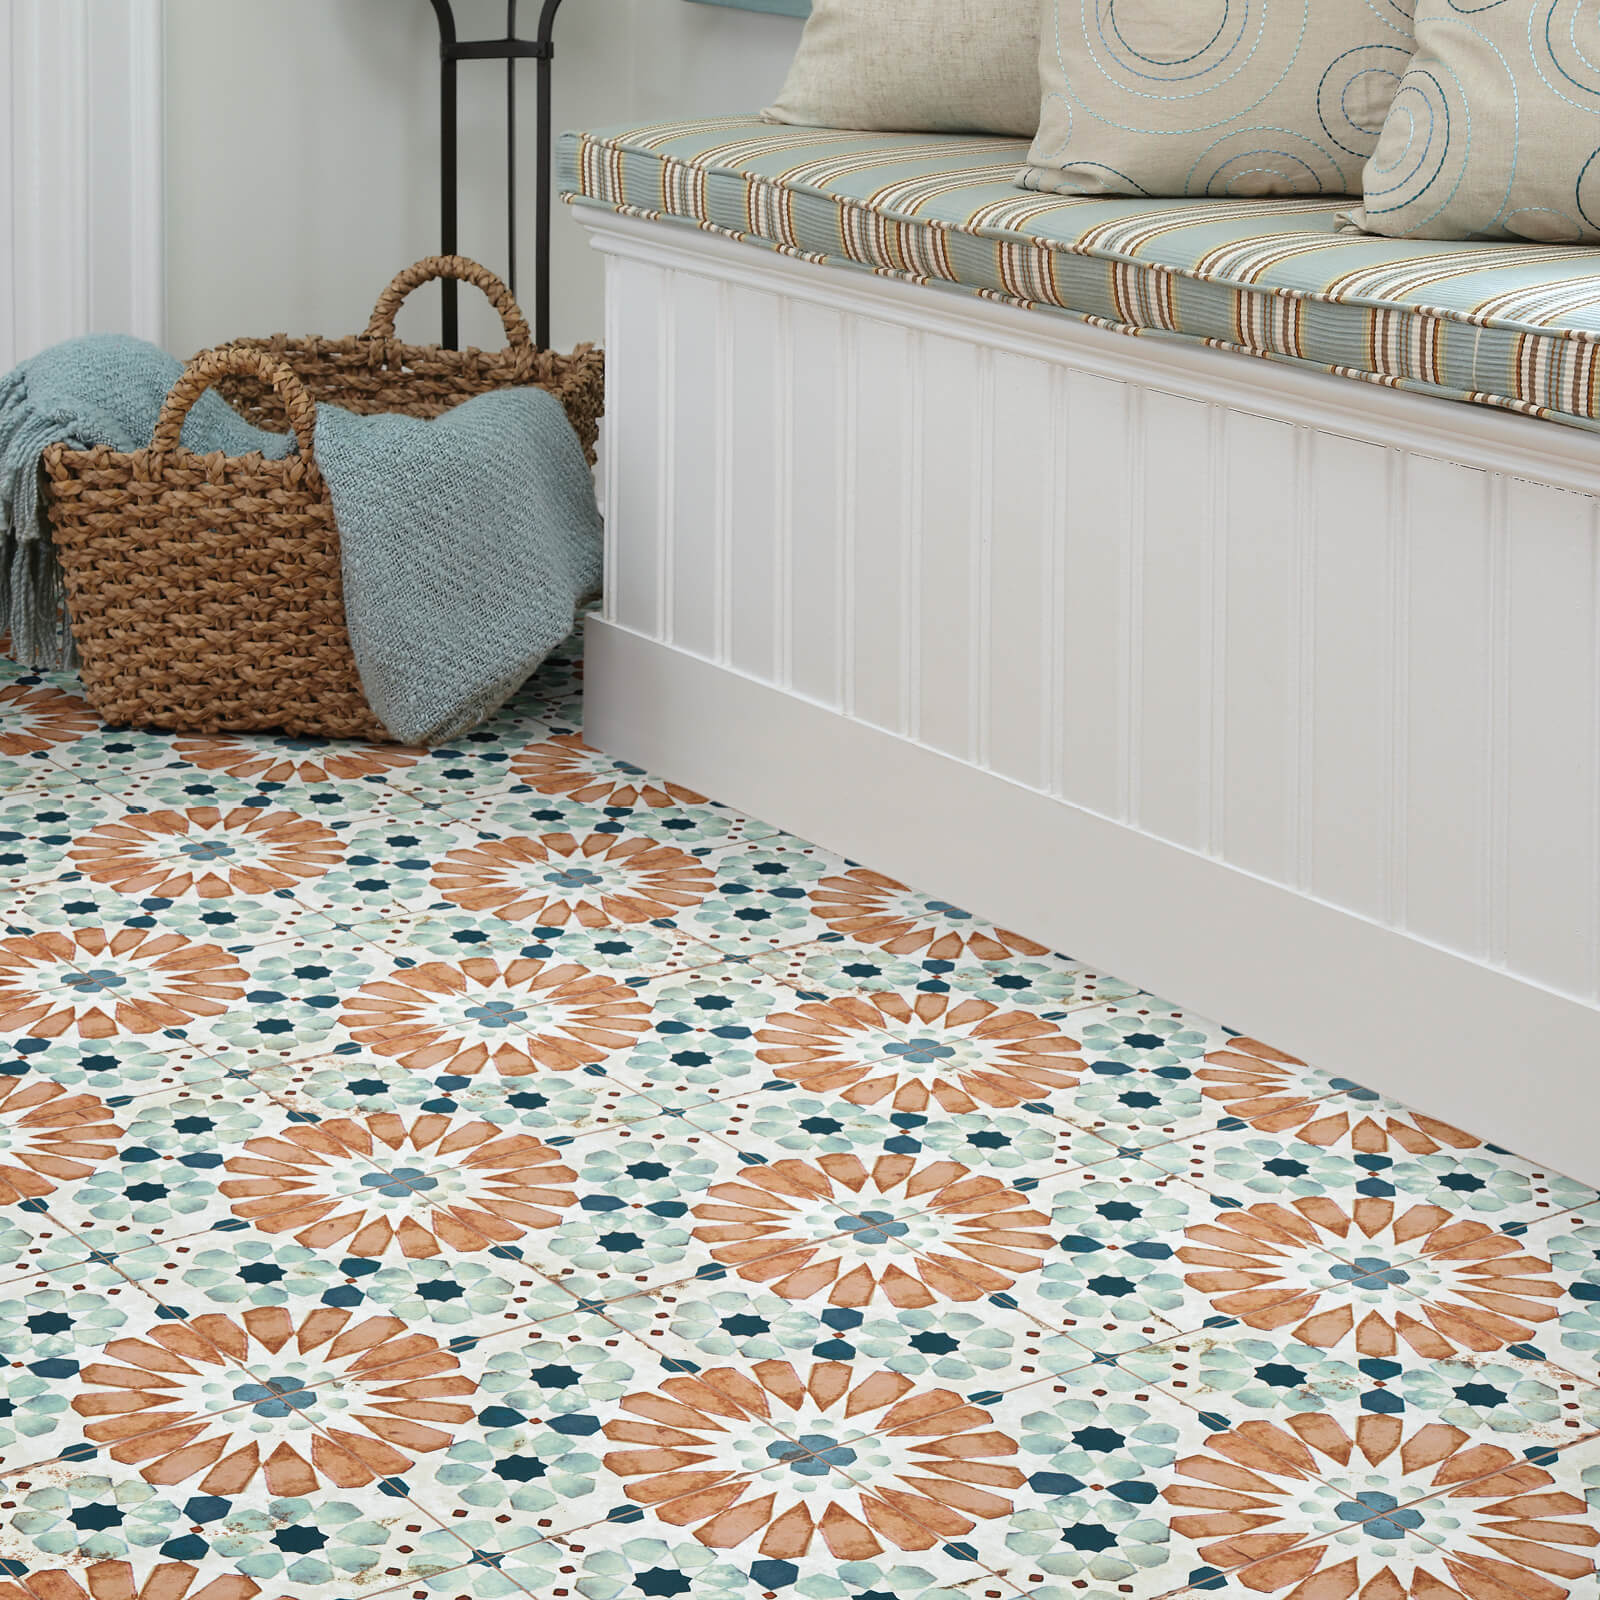 Deco Tile | Flooring By Design